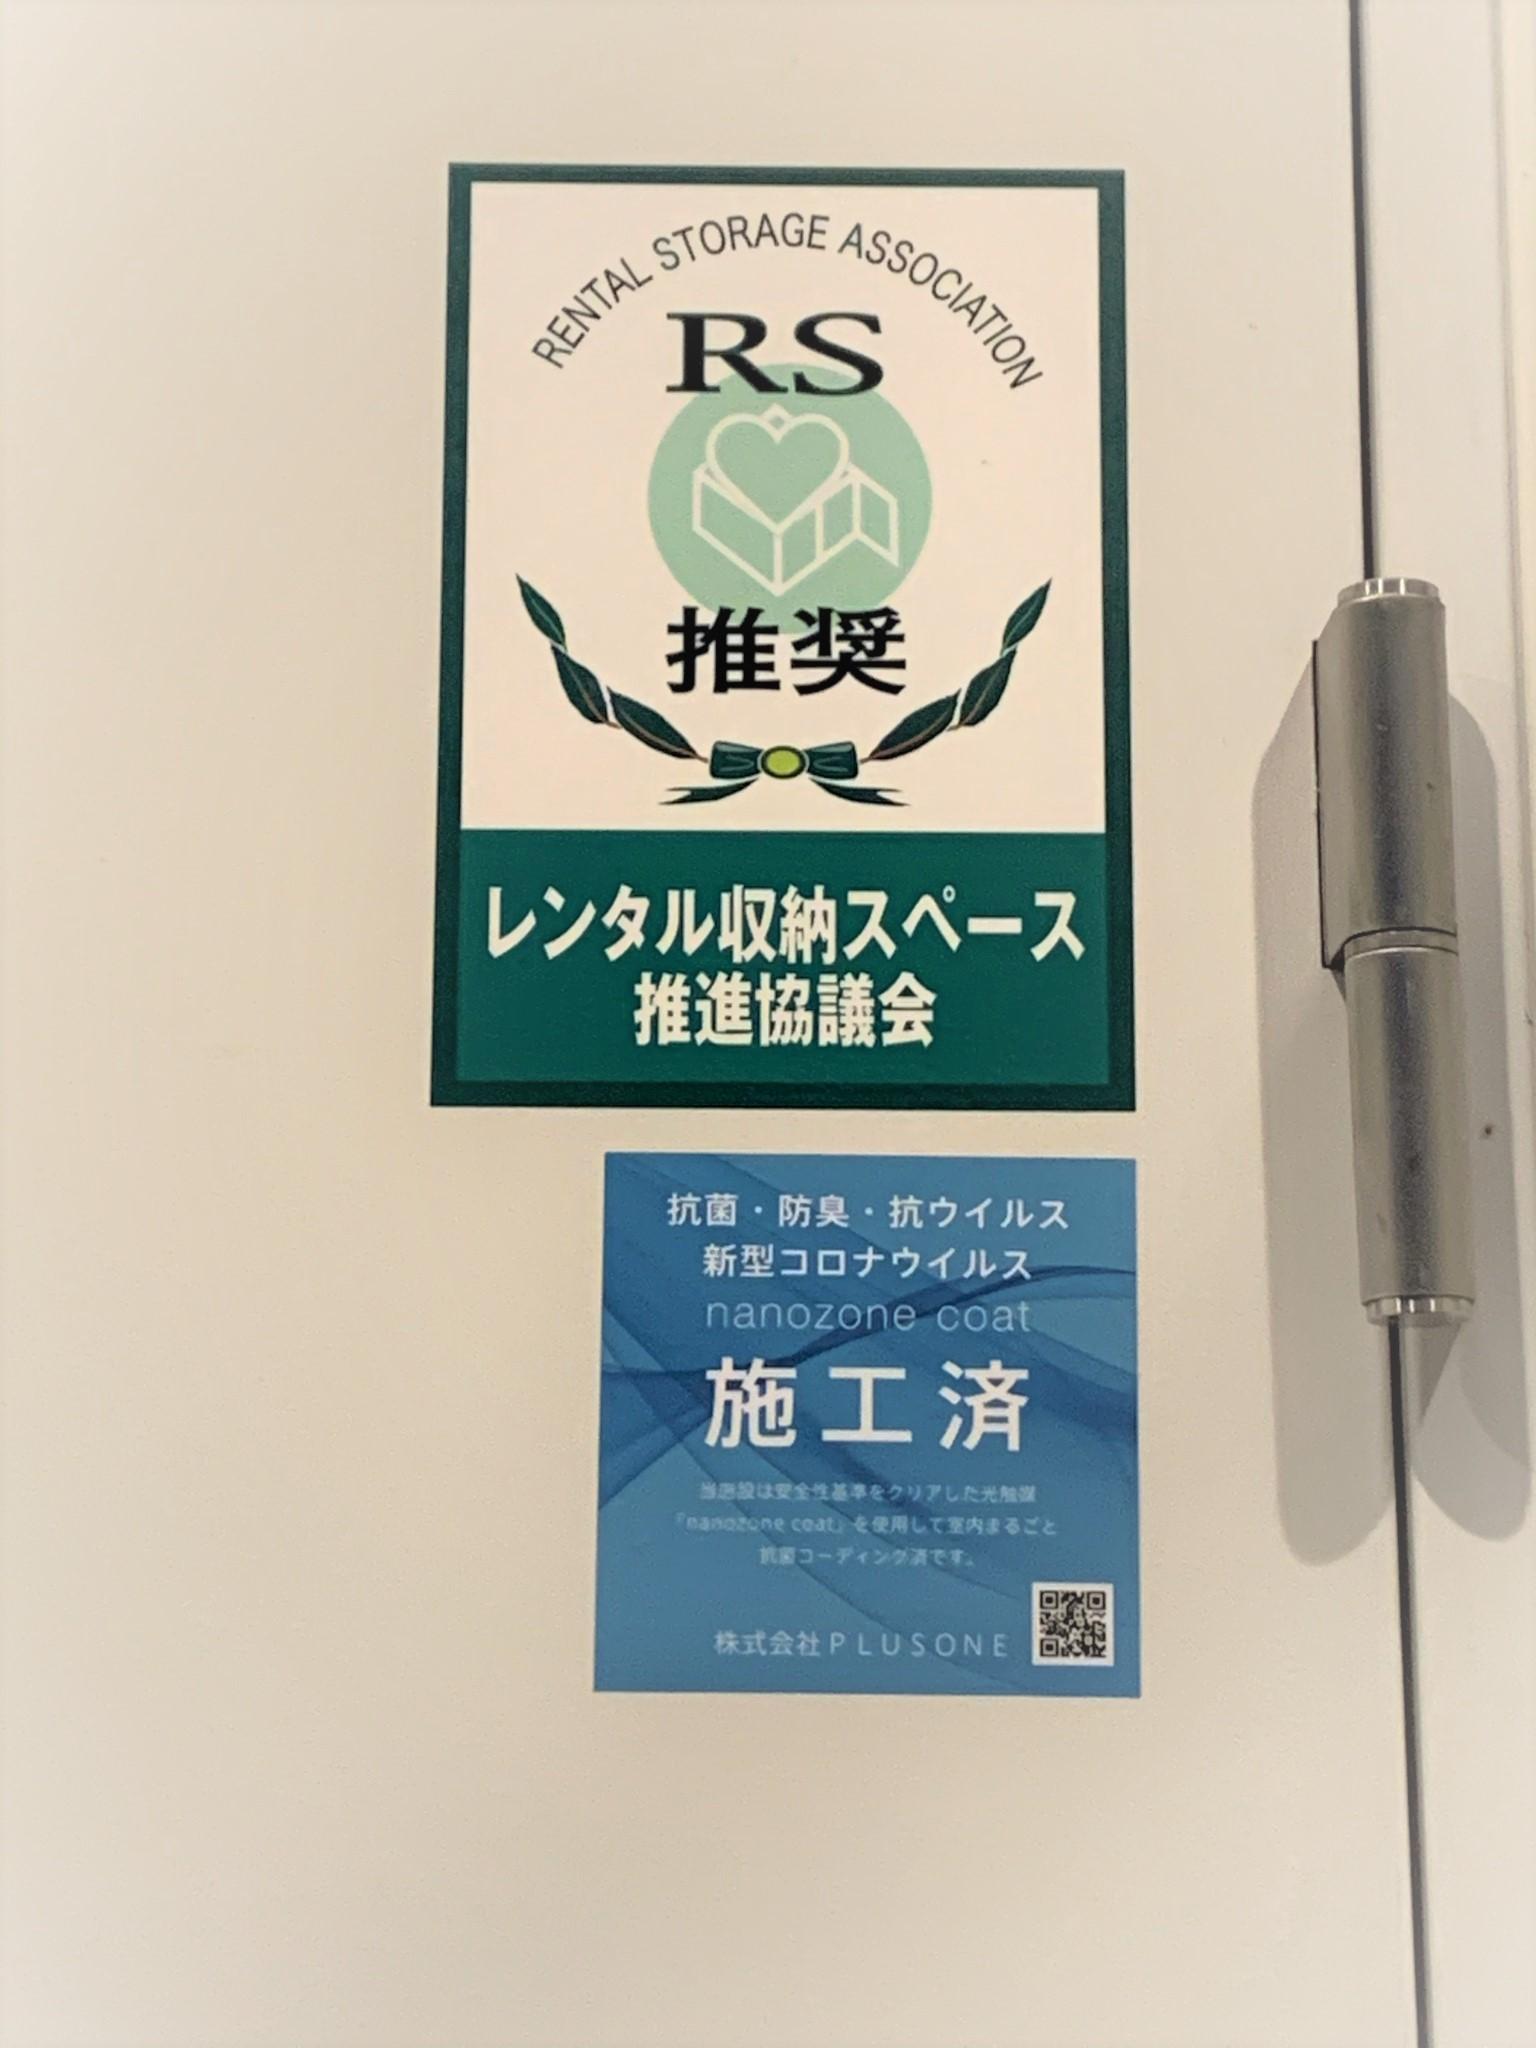 RS推奨マークと光触媒酸化チタン抗菌施工済シール